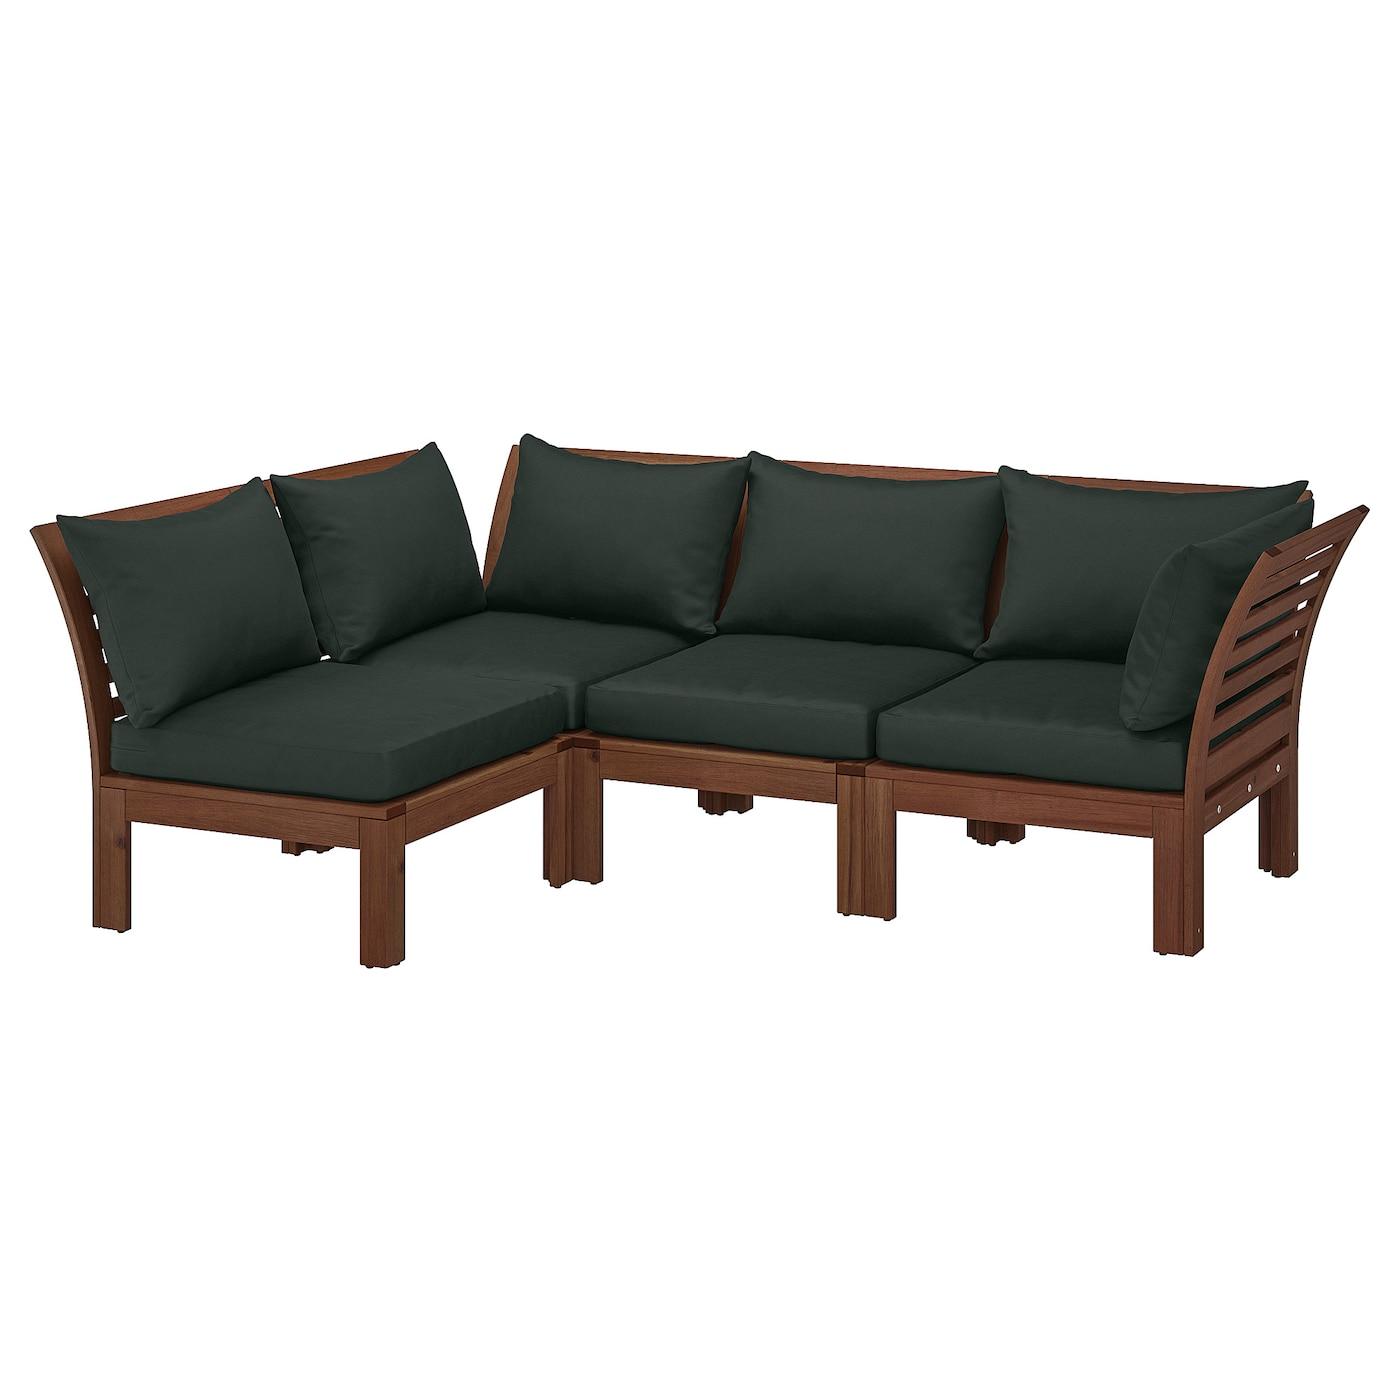 ÄPPLARÖ - Modular corner sofa 3-seat, outdoor, brown stained,  Frösön/Duvholmen dark gray